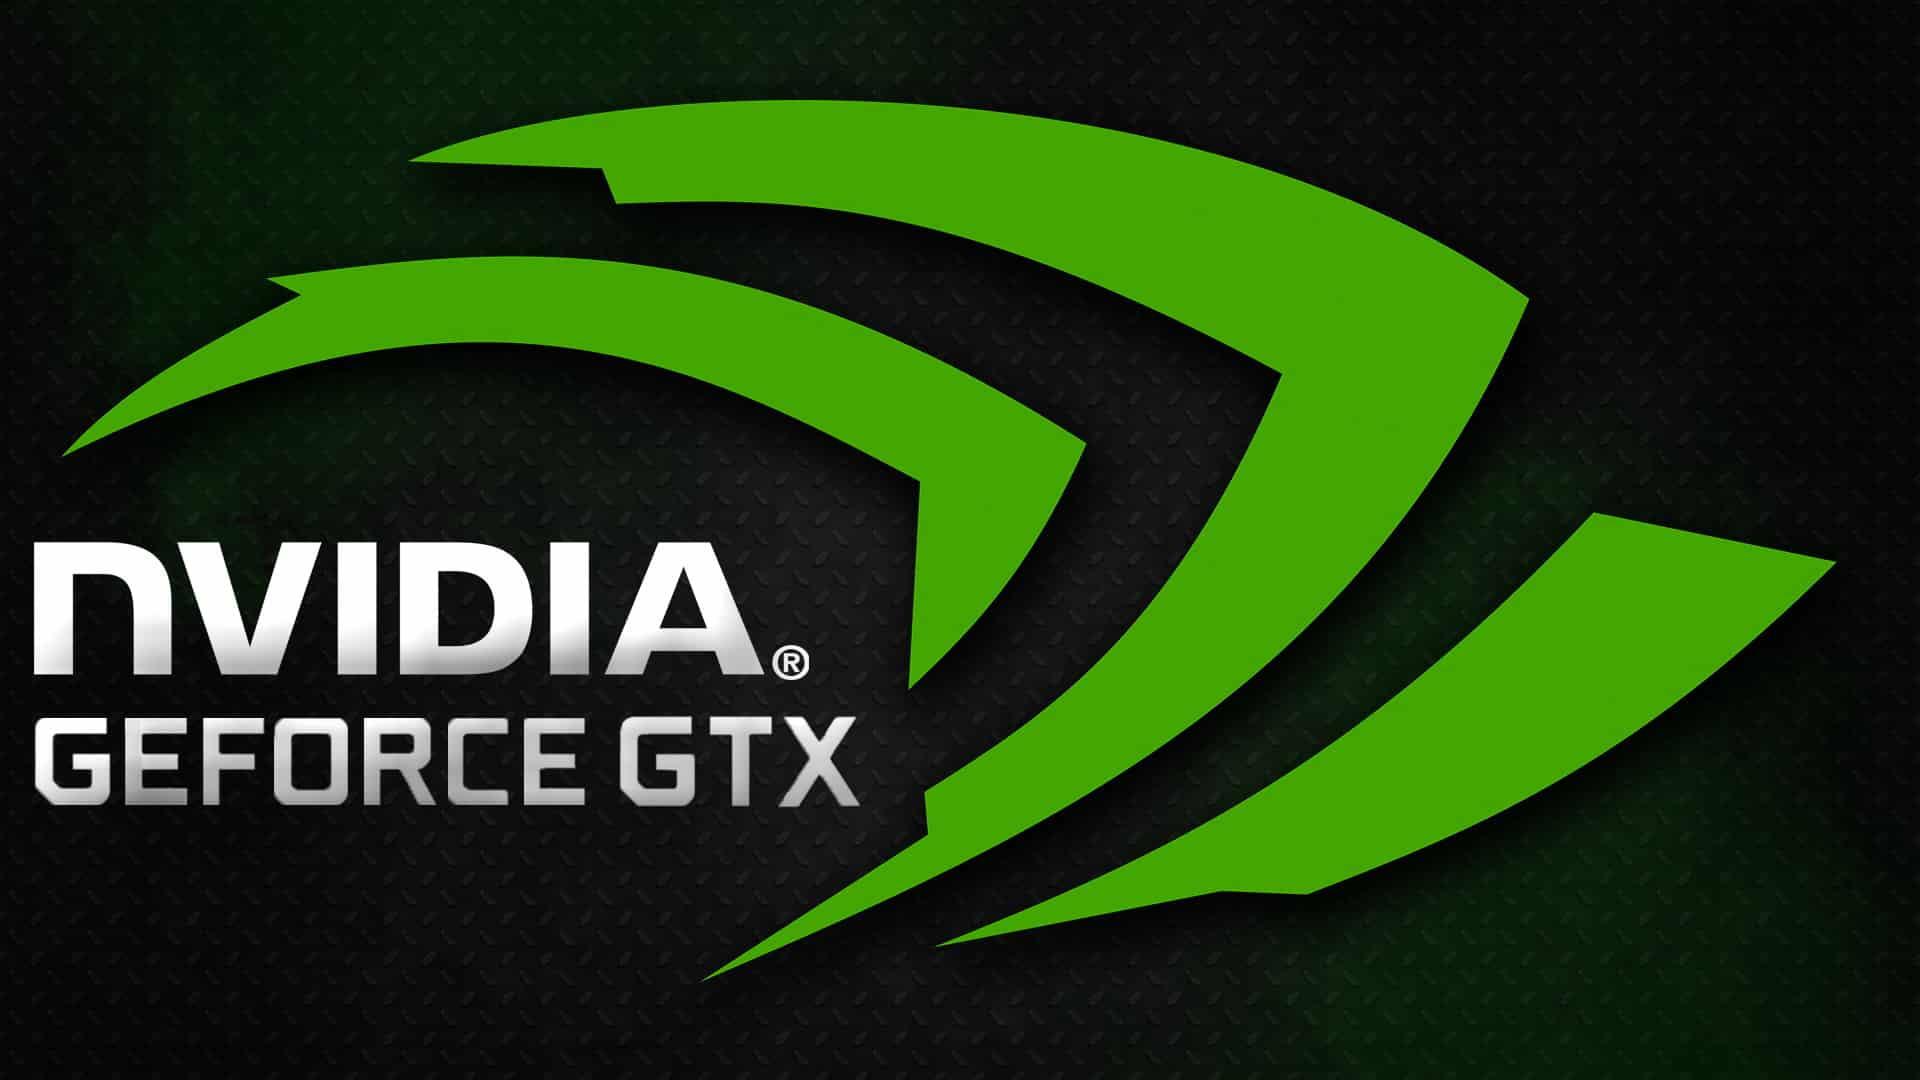 NVIDIA GeForce 364.72 WHQL Driver per Oculus Rift & Dark Souls III